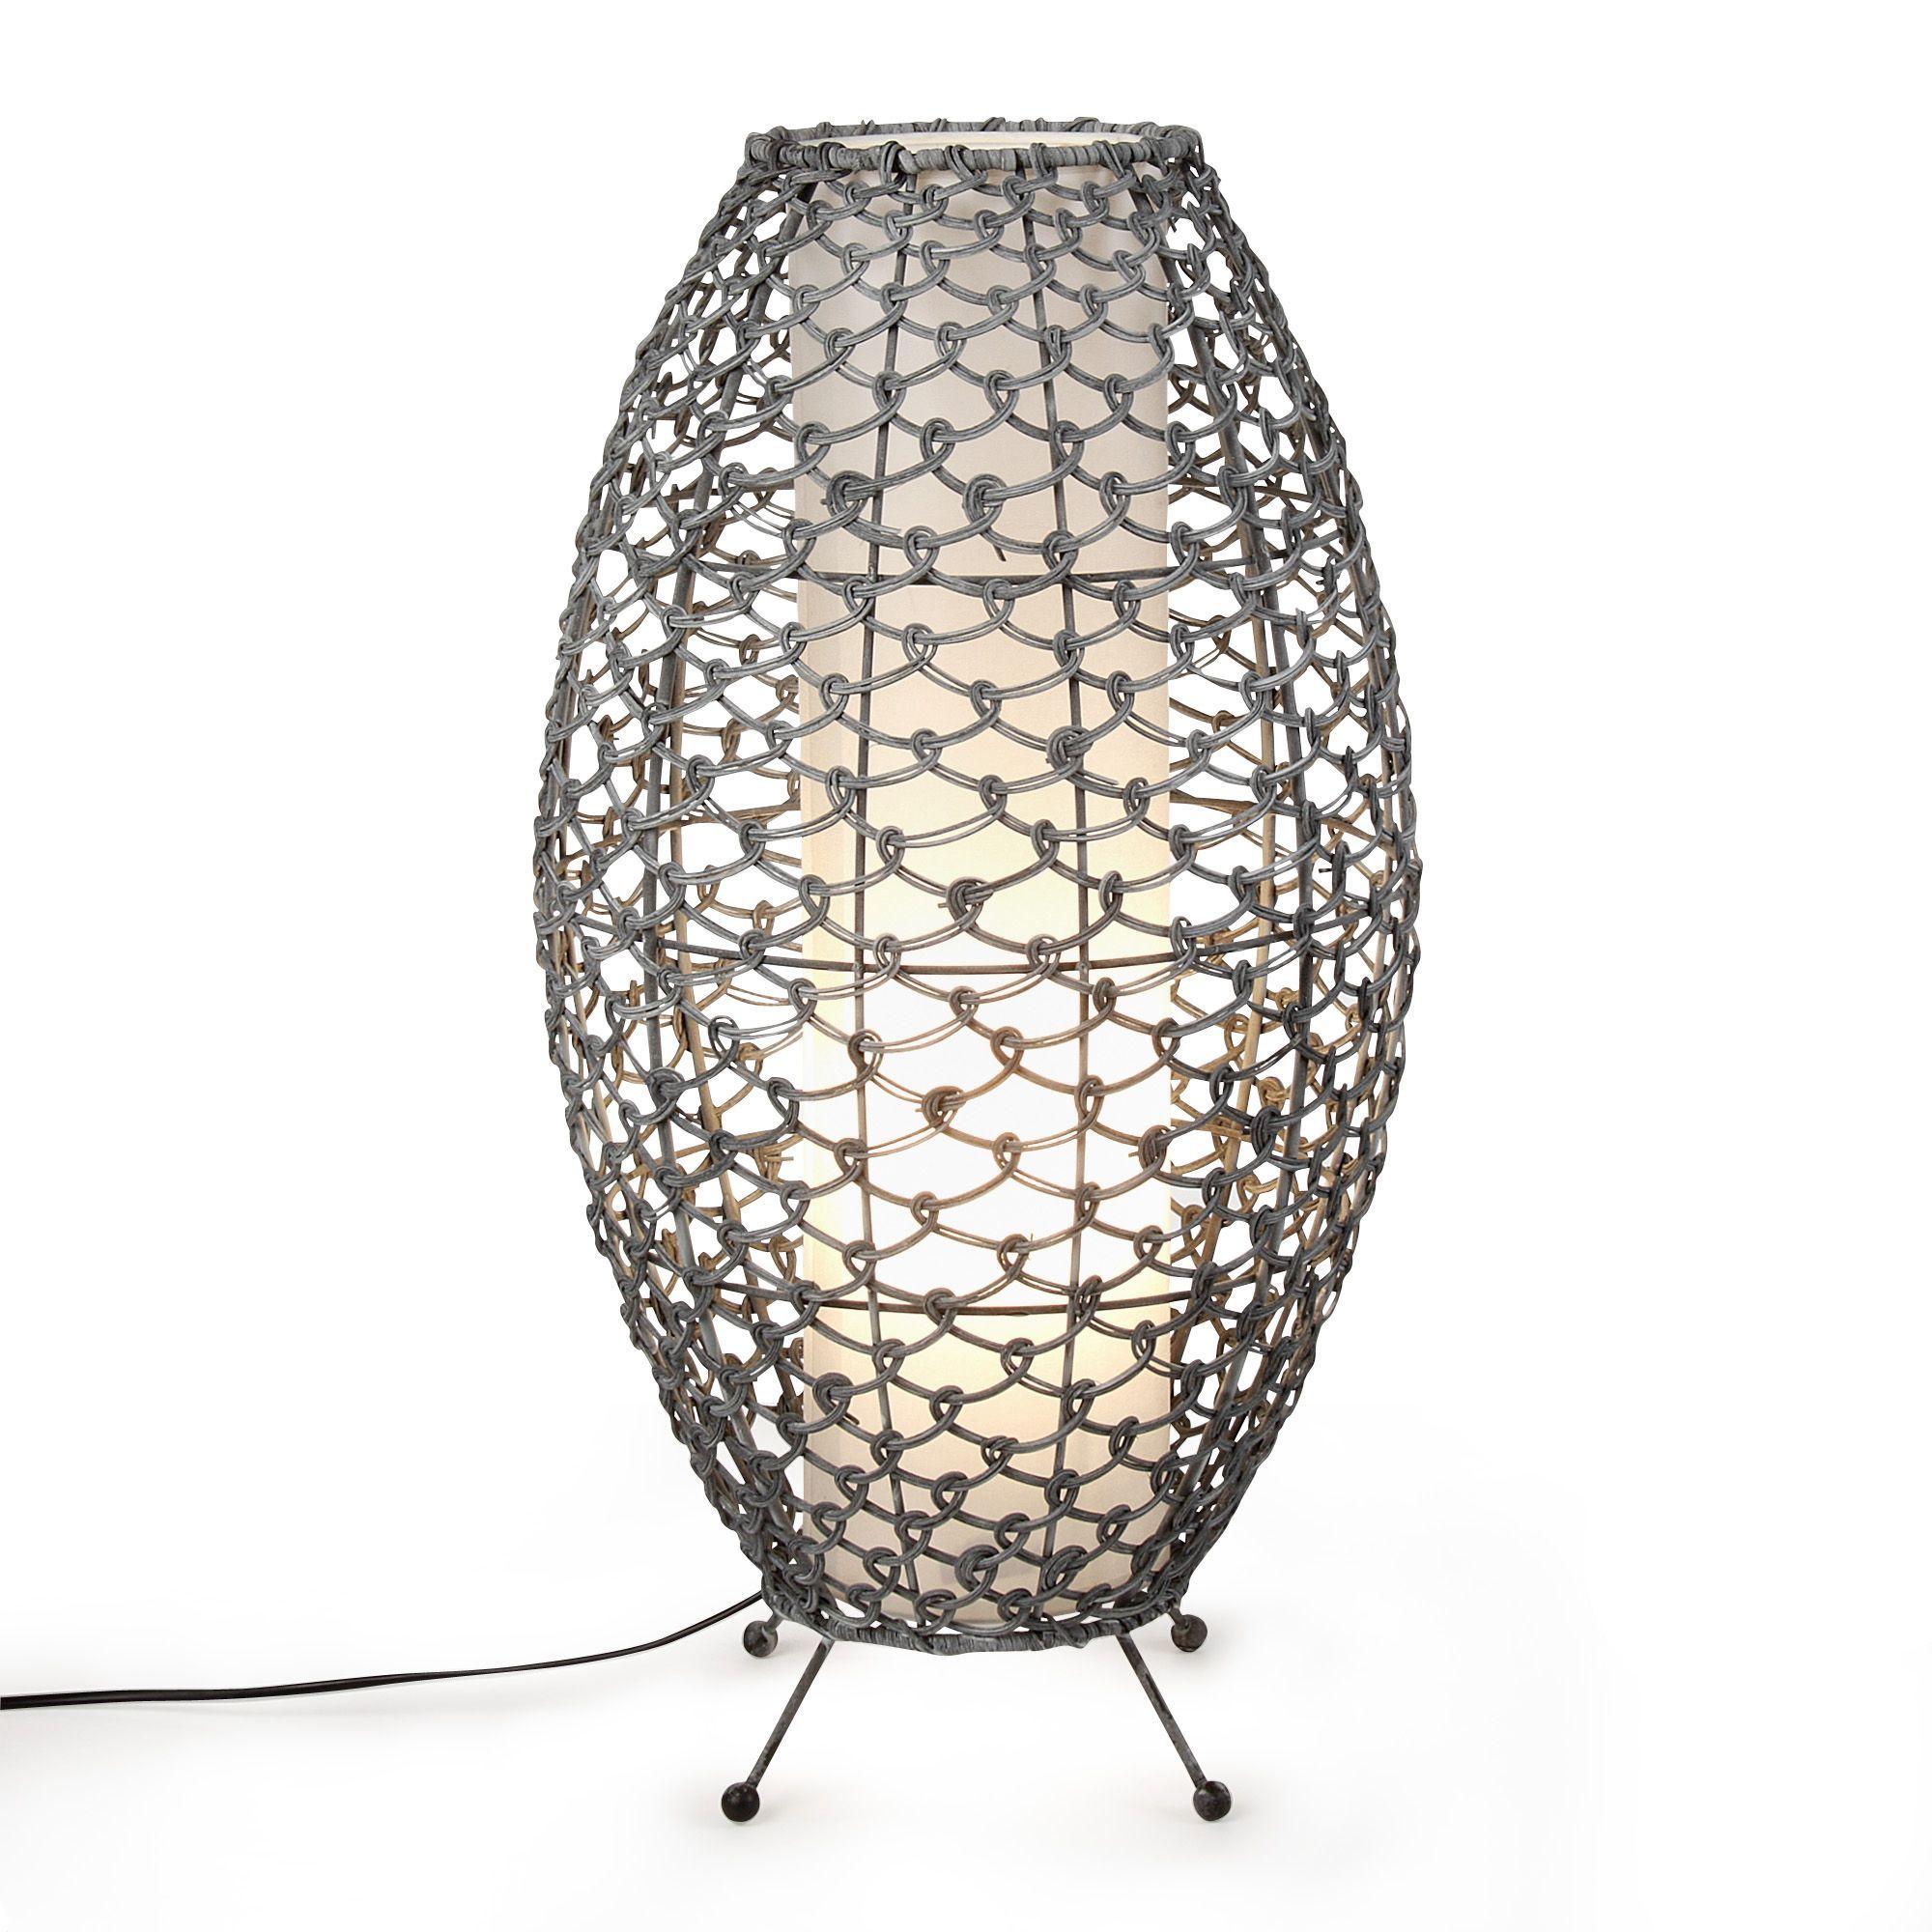 Lampes De Salon Design A Poser Finest Lampe A Poser Lampe Poser En